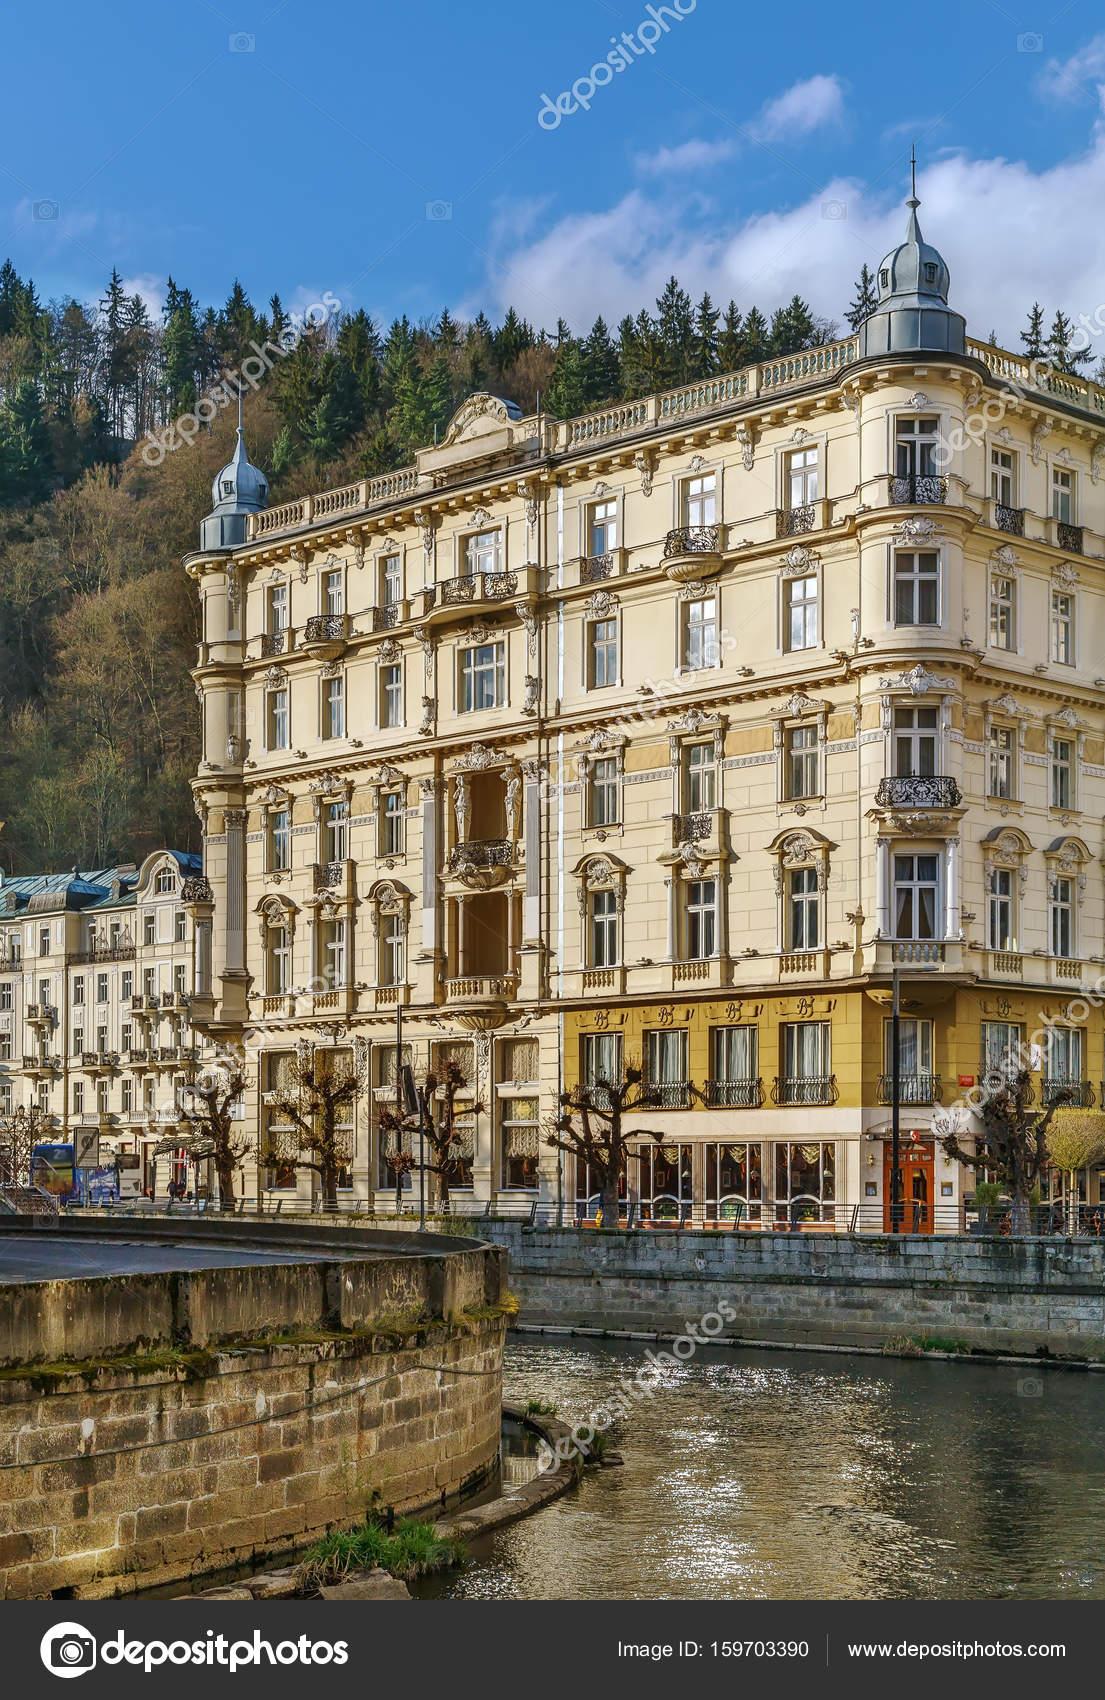 Grandhotel Pupp Karlovy Vary Czech Republic Stock Photo Image By Borisb17 159703390